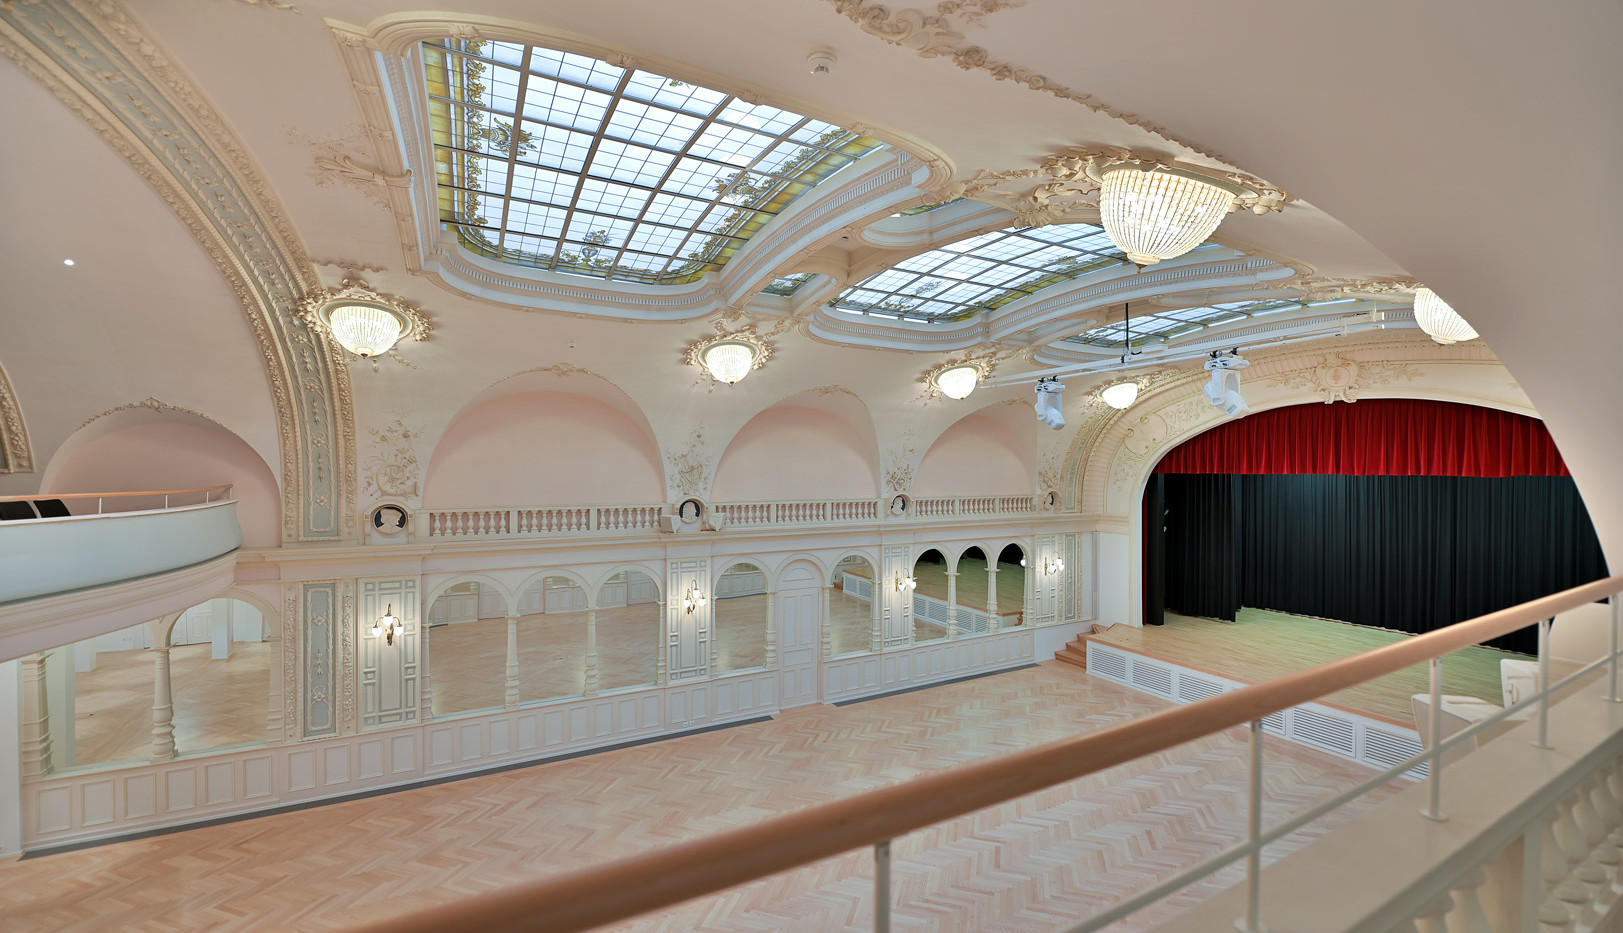 KSE_Kursaal_7.jpg